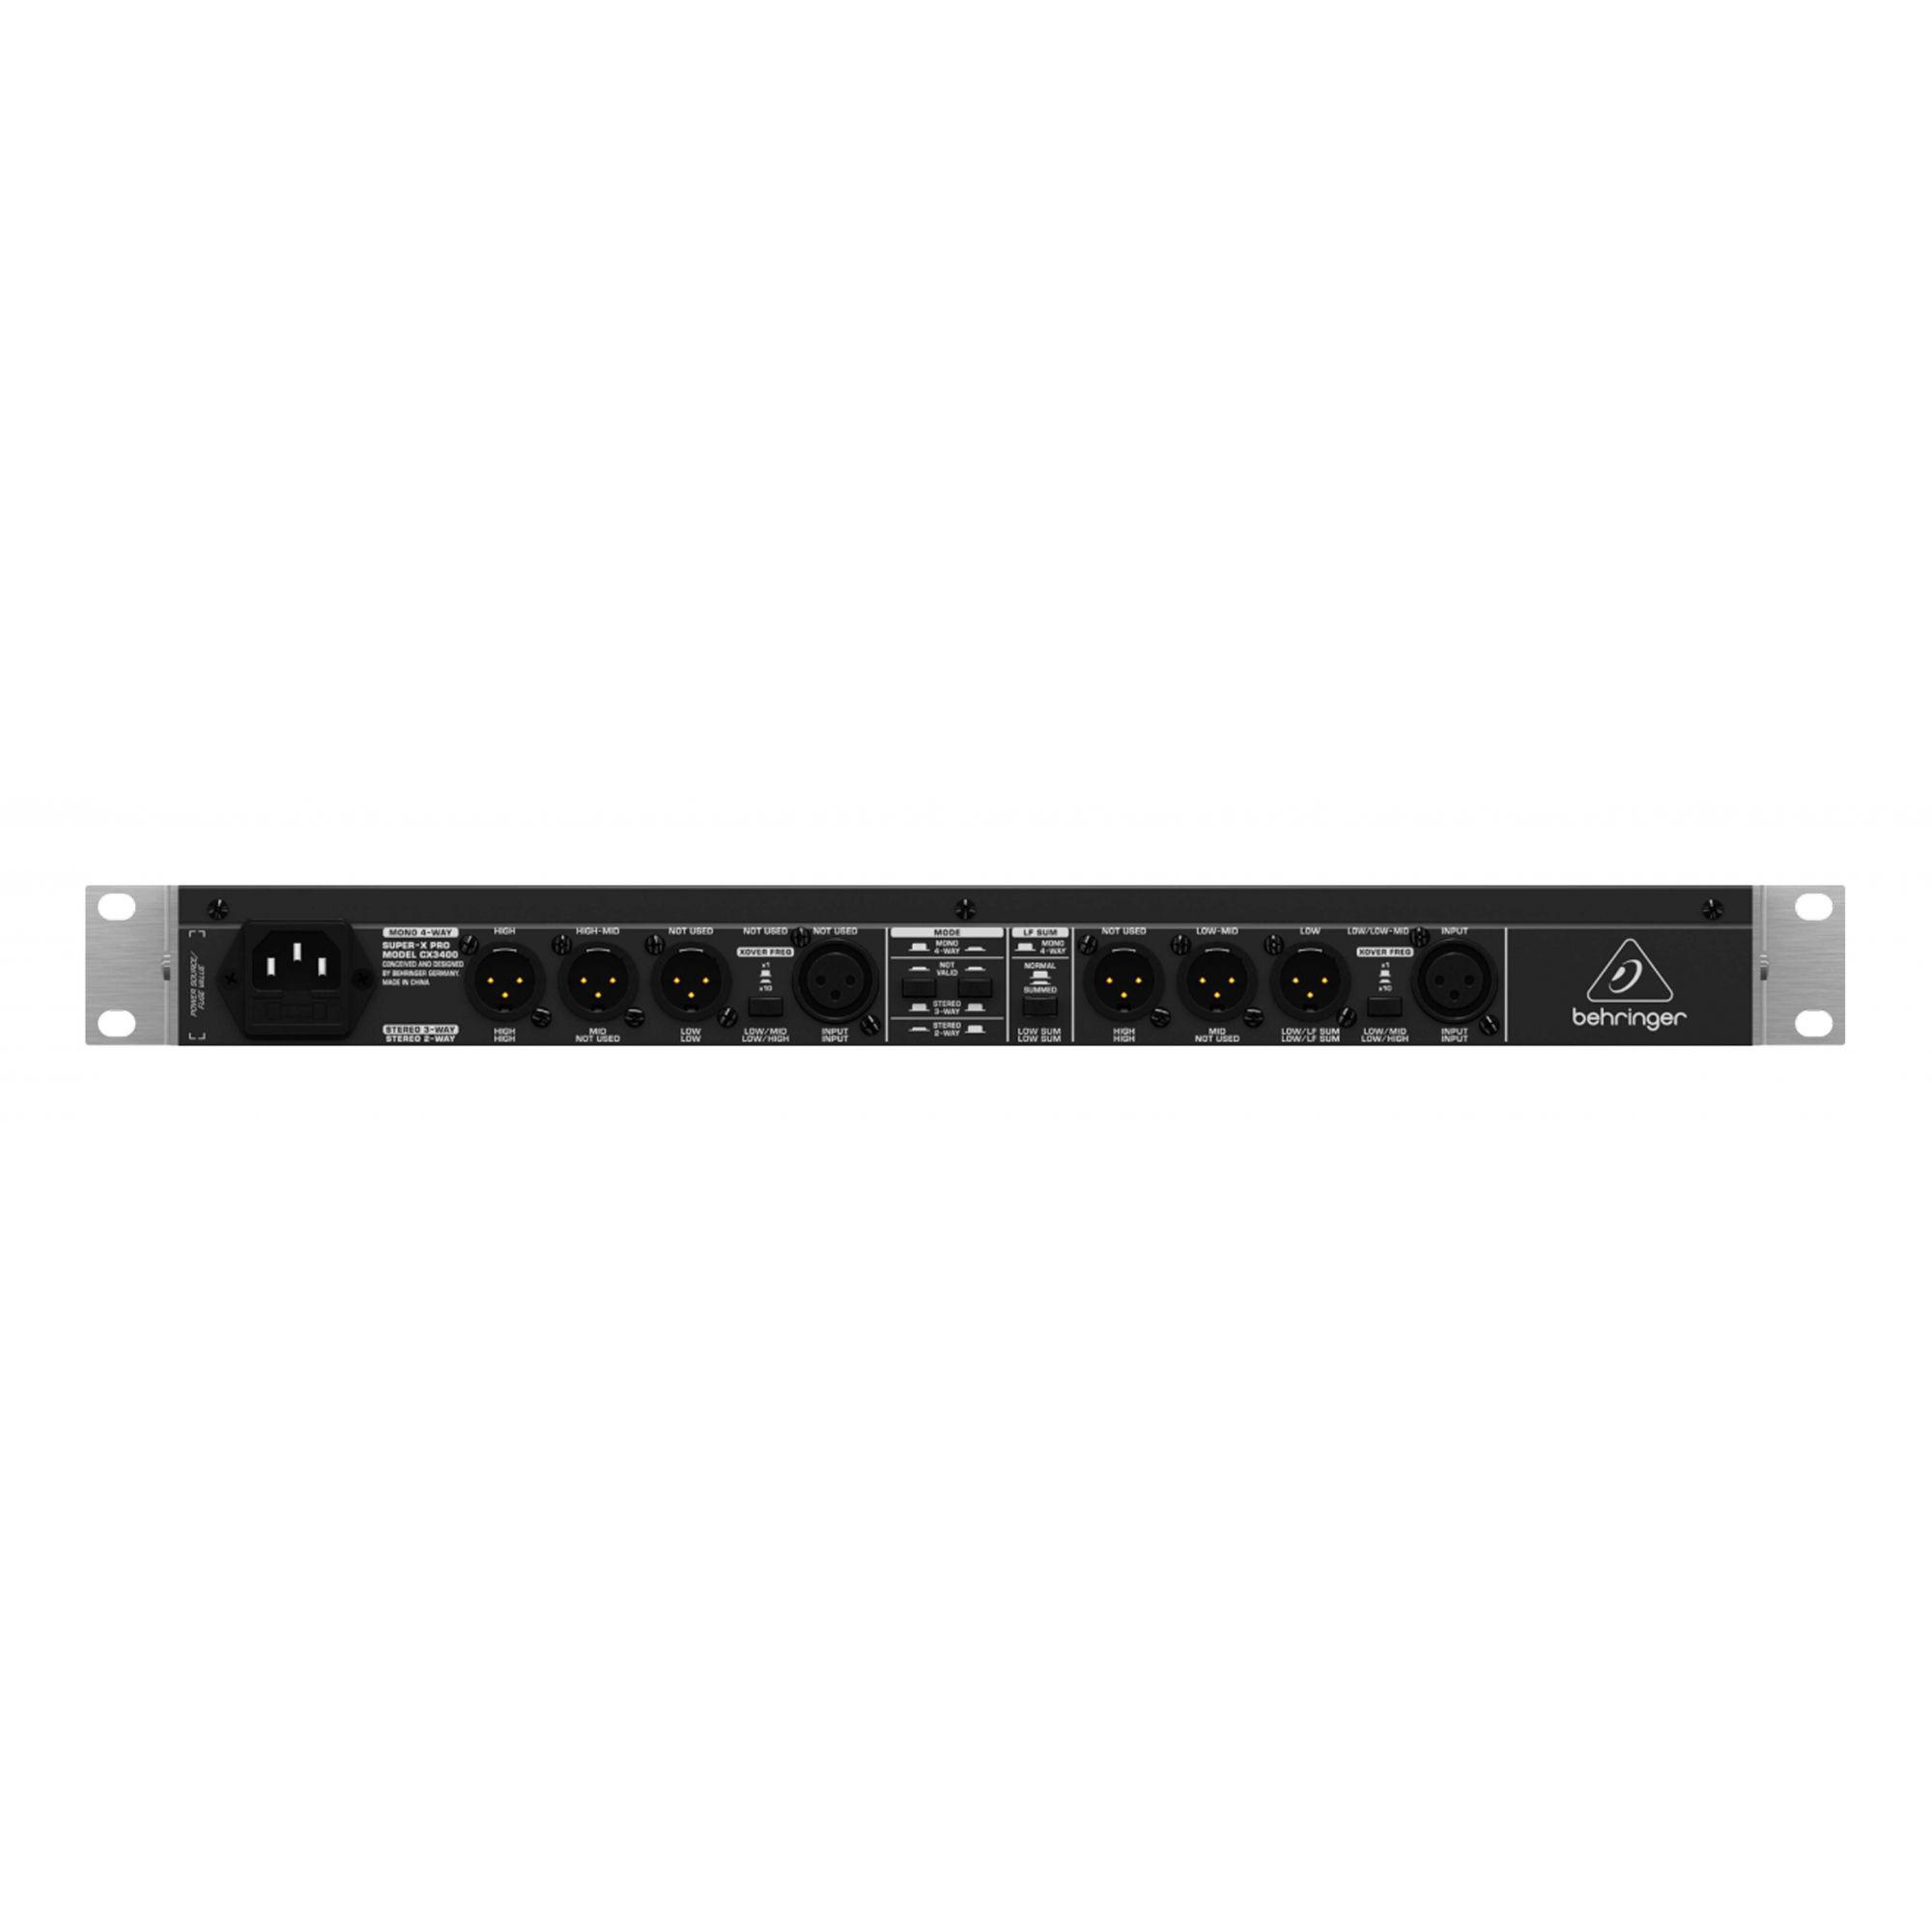 Crossover com 3 vias estéreo ou 4 vias mono| Limiter individual, Delay e Saida Sub | Behringer | SUPER-X PRO CX3400